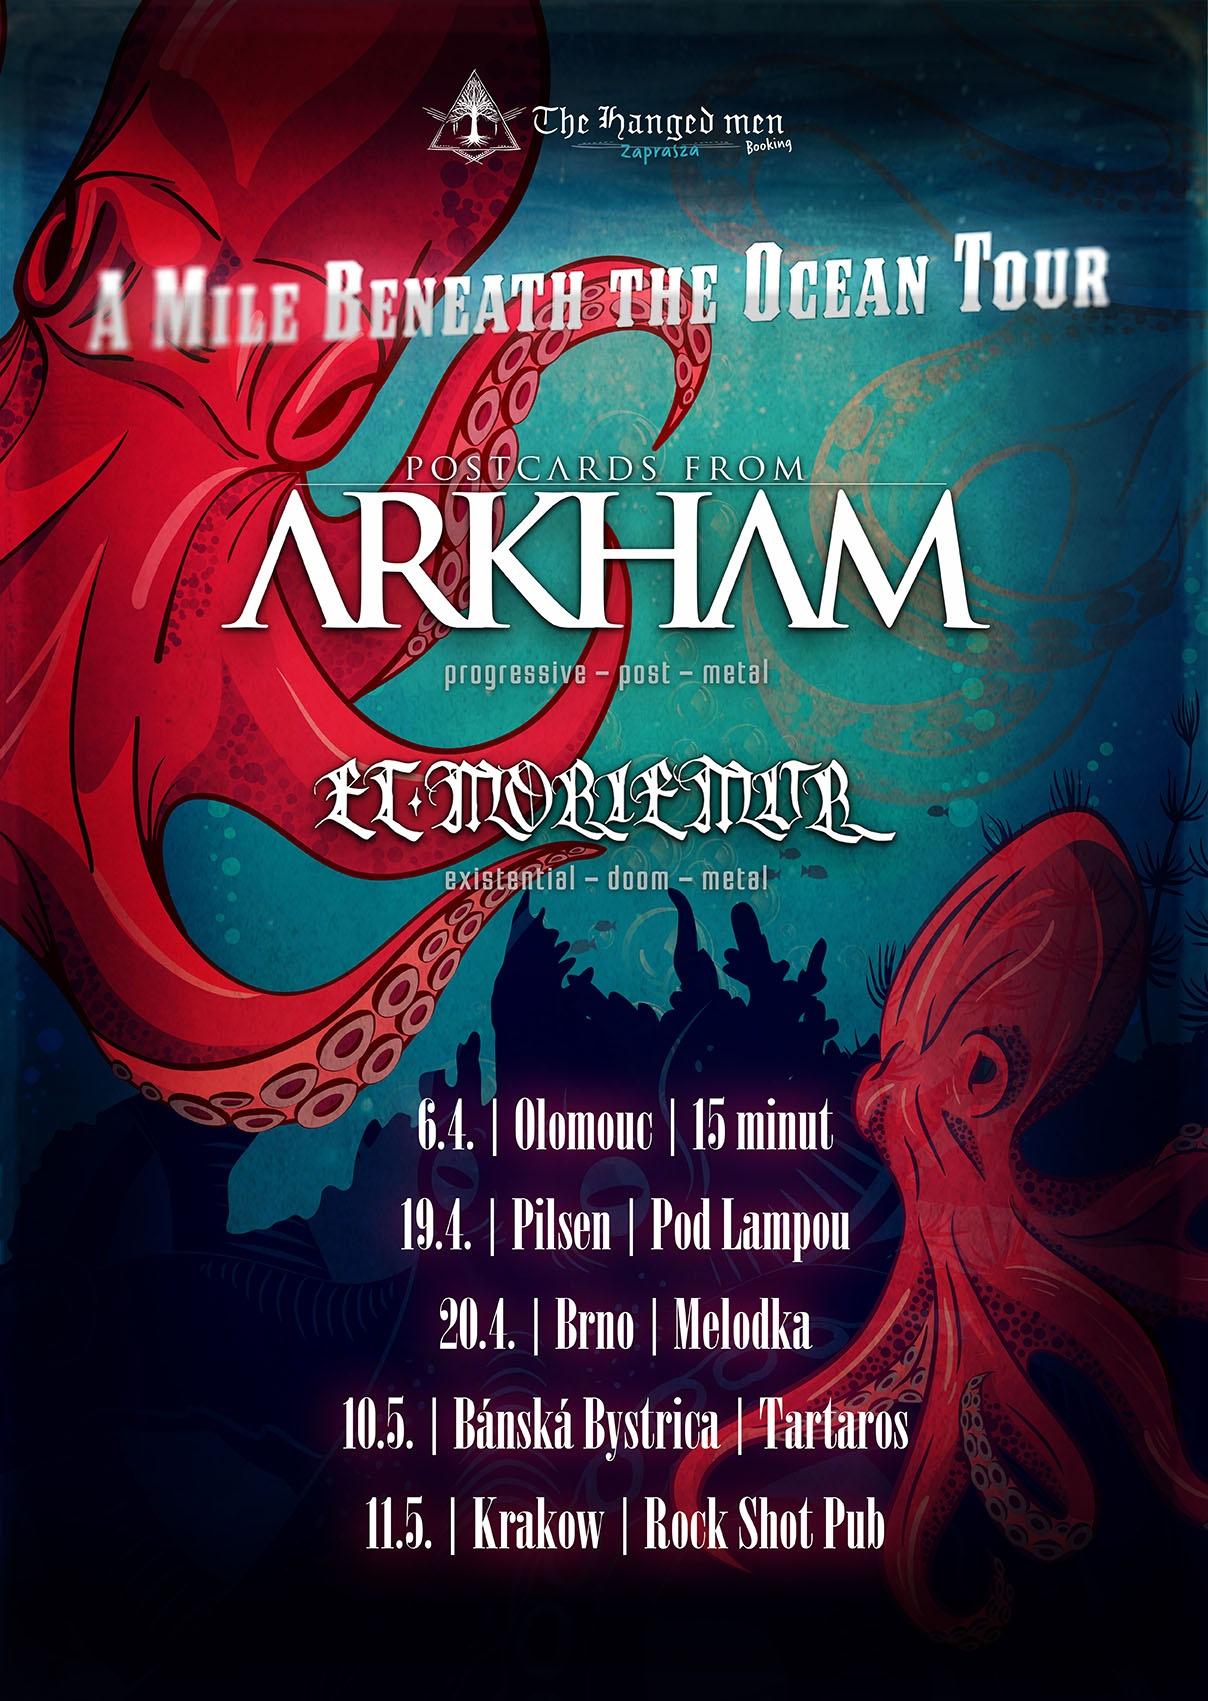 Et Moriemur a Postcards From Arkham